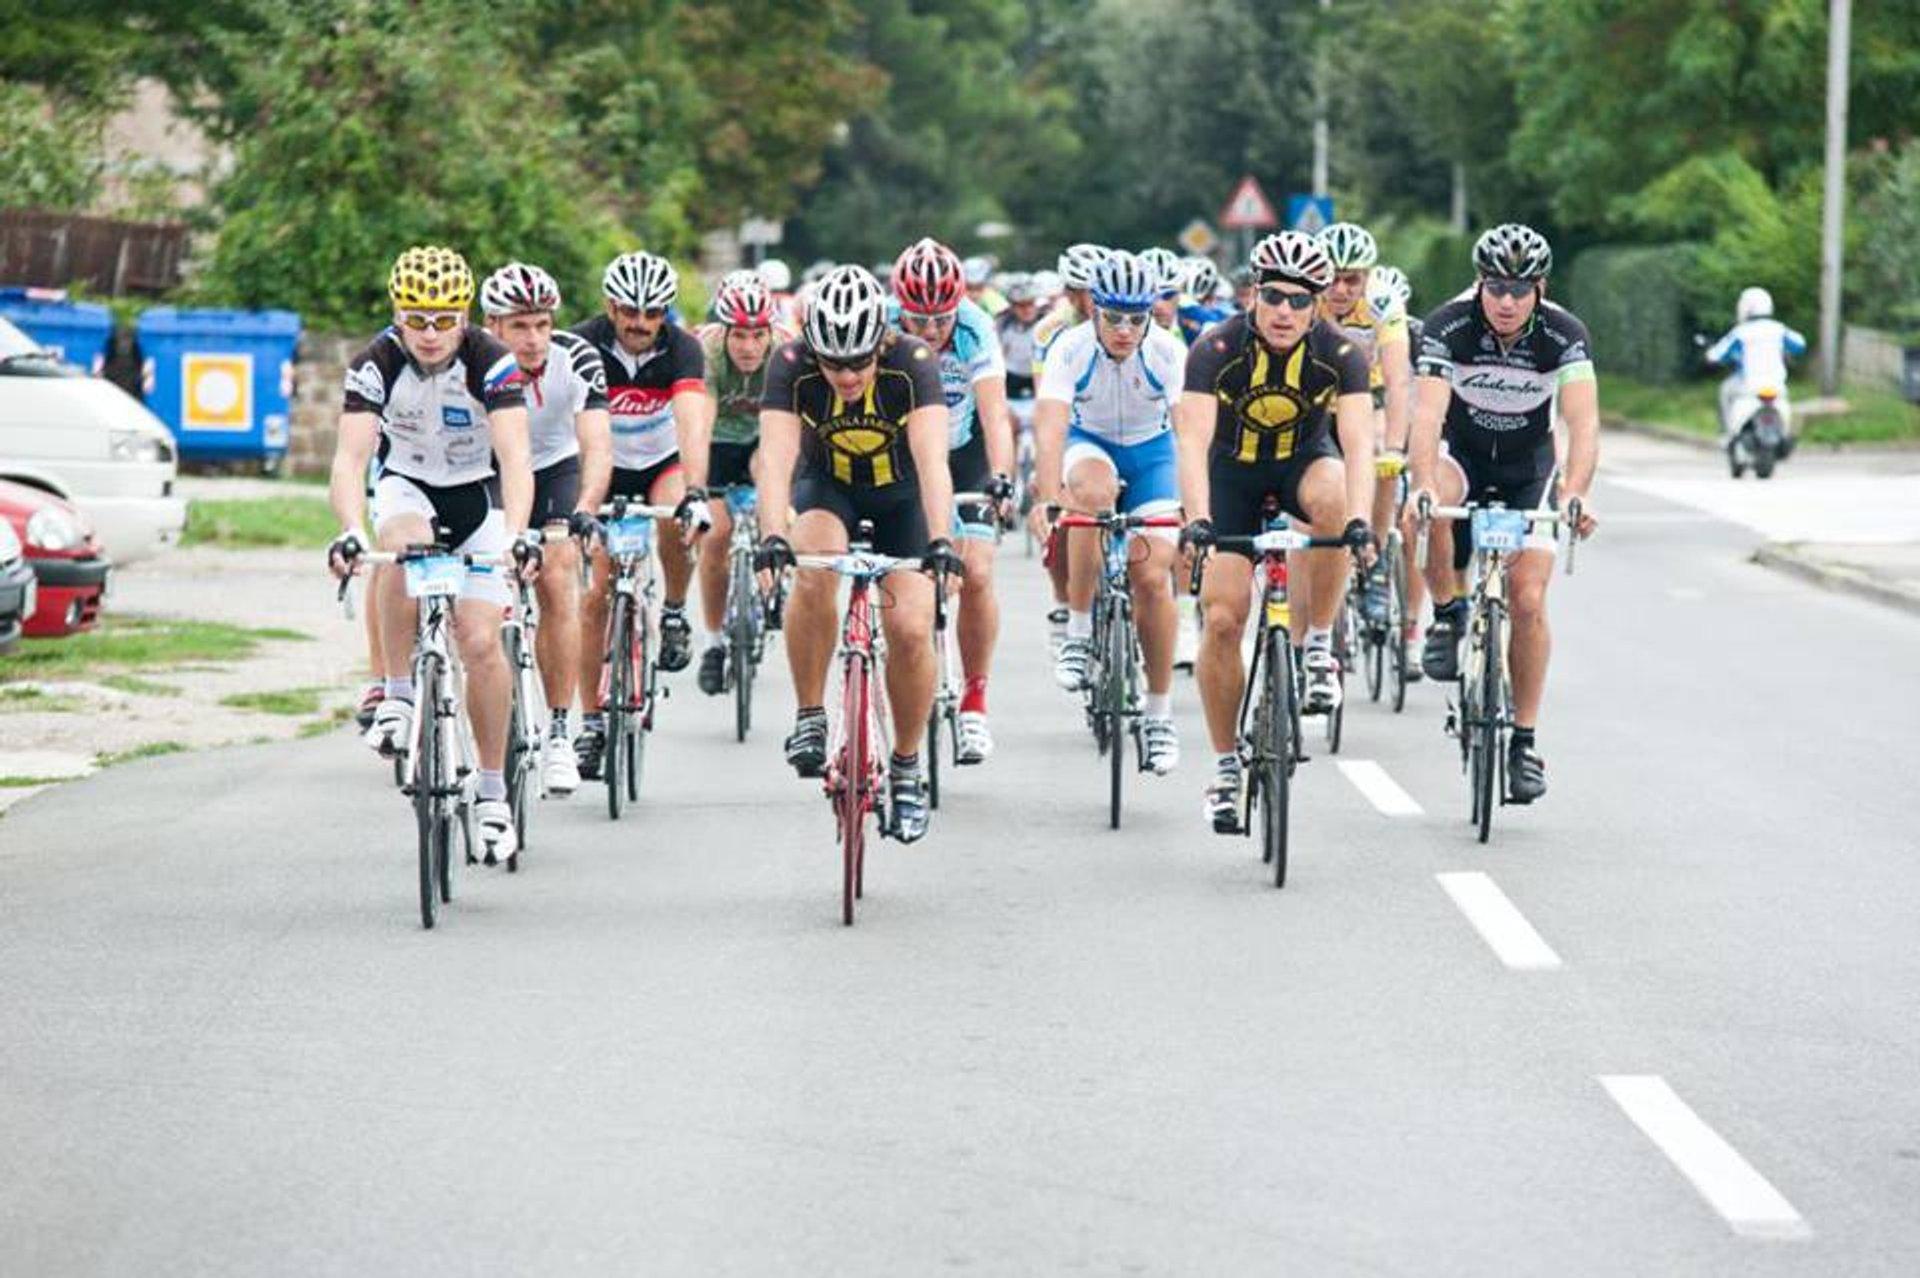 Istrian Cycling Marathon in Slovenia - Best Season 2020